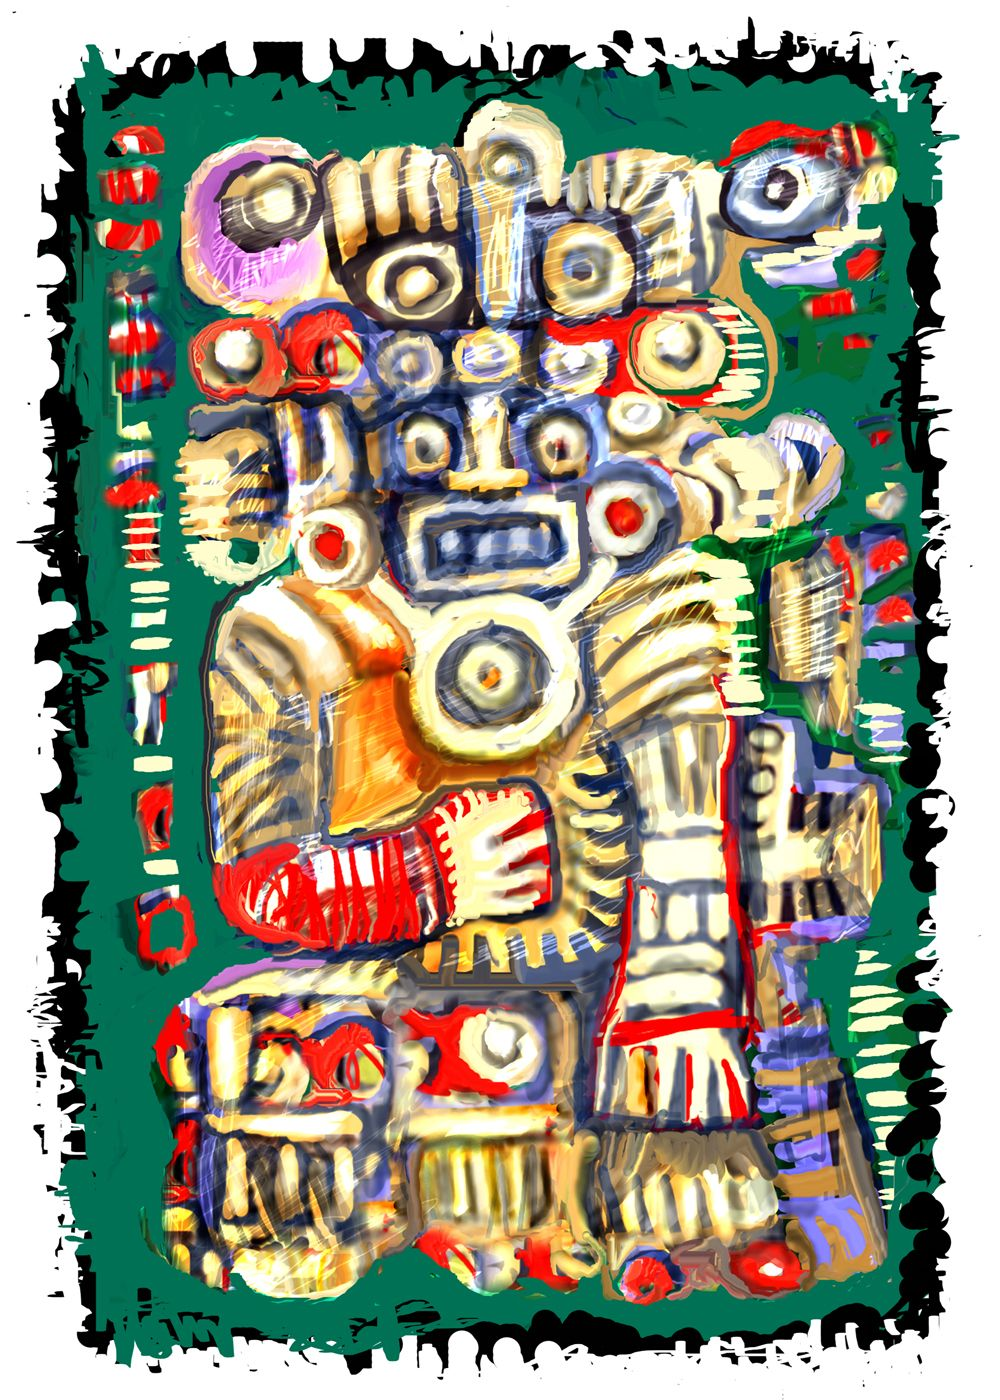 THE ALBRUNO'S UNIQUE DIGITAL ART... Digital painting by